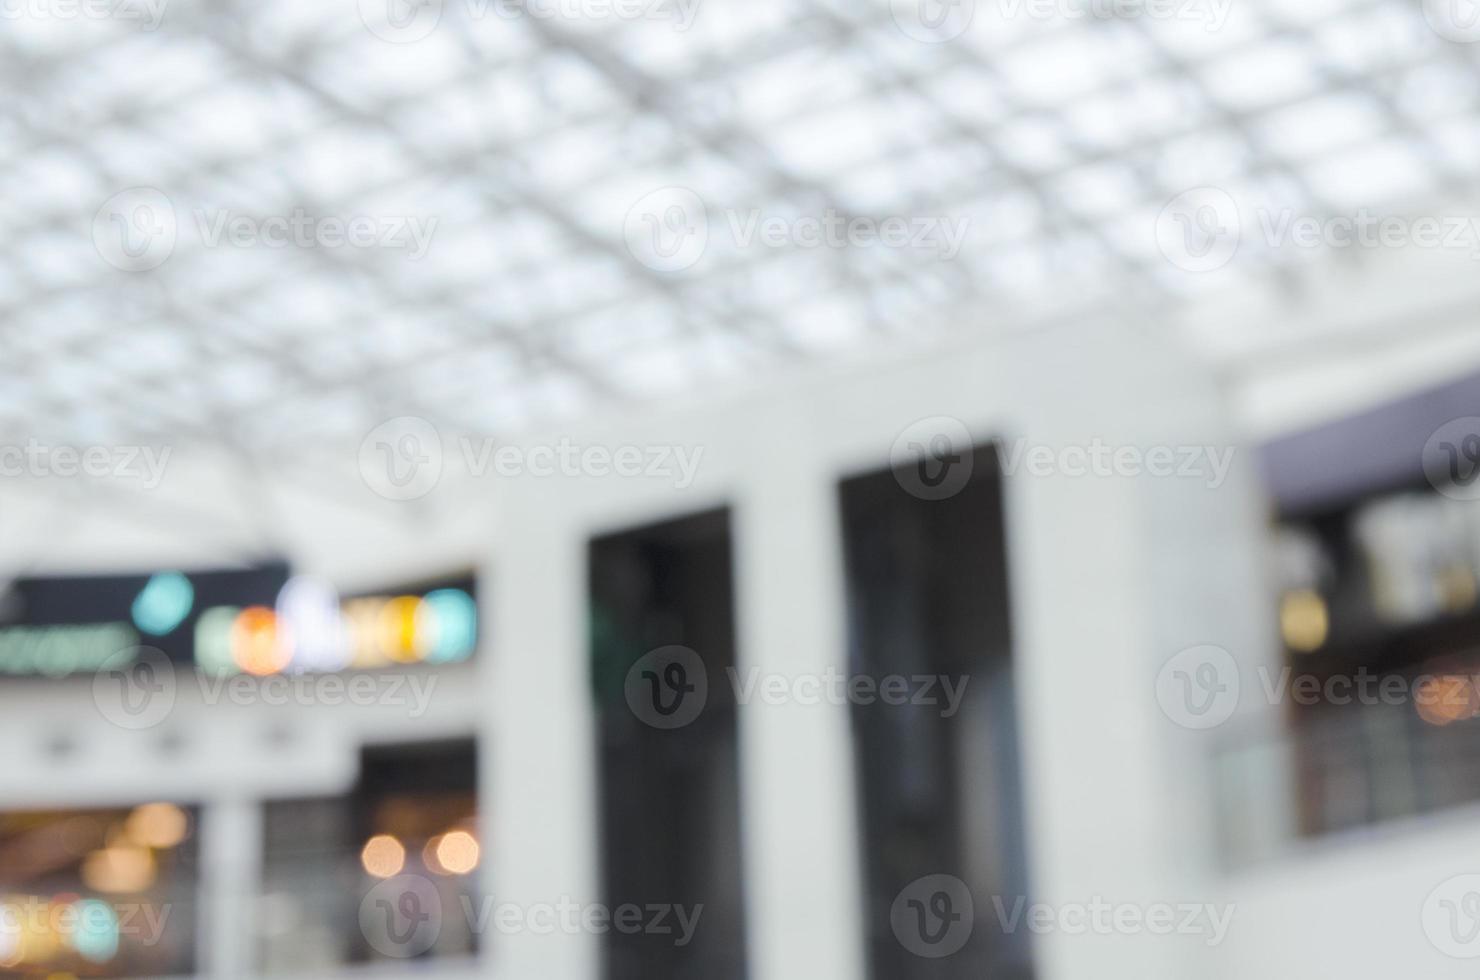 intreepupil zakelijke lobby plafond achtergrond - stock beeld foto